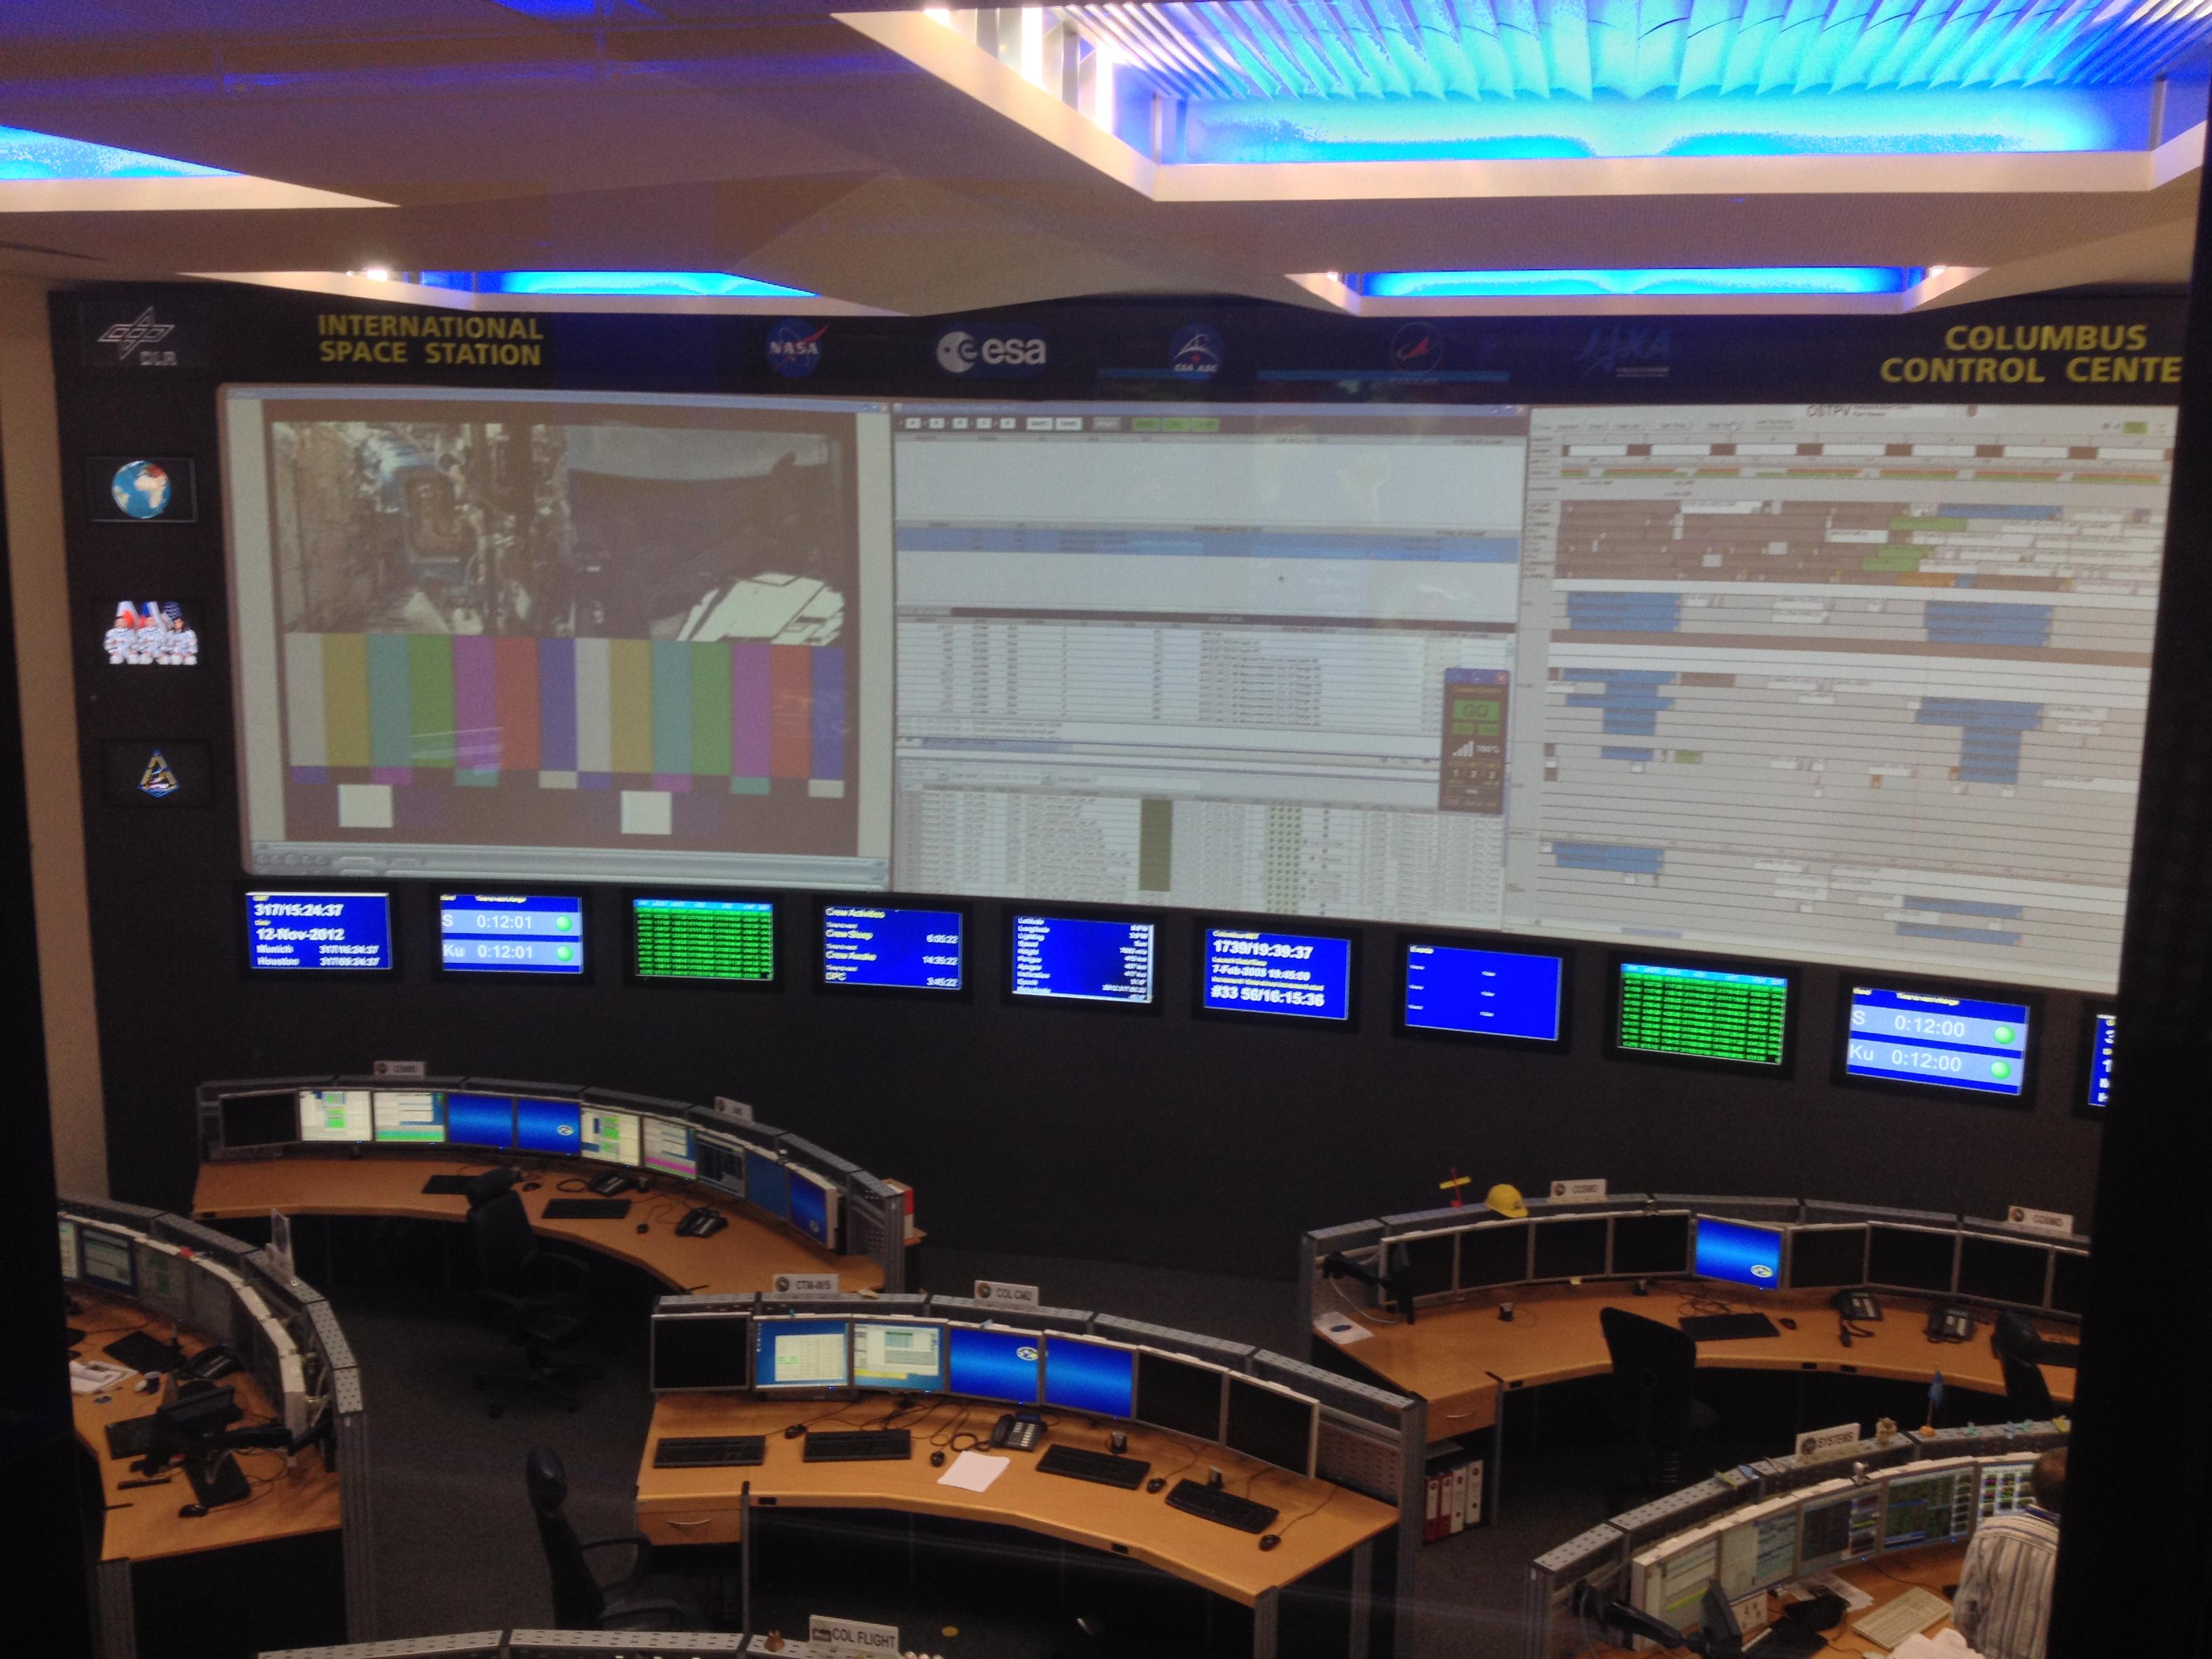 Datei:Columbus Control Center at DLR Oberpfaffenhoffen (8182061318).jpg –  Wikipedia